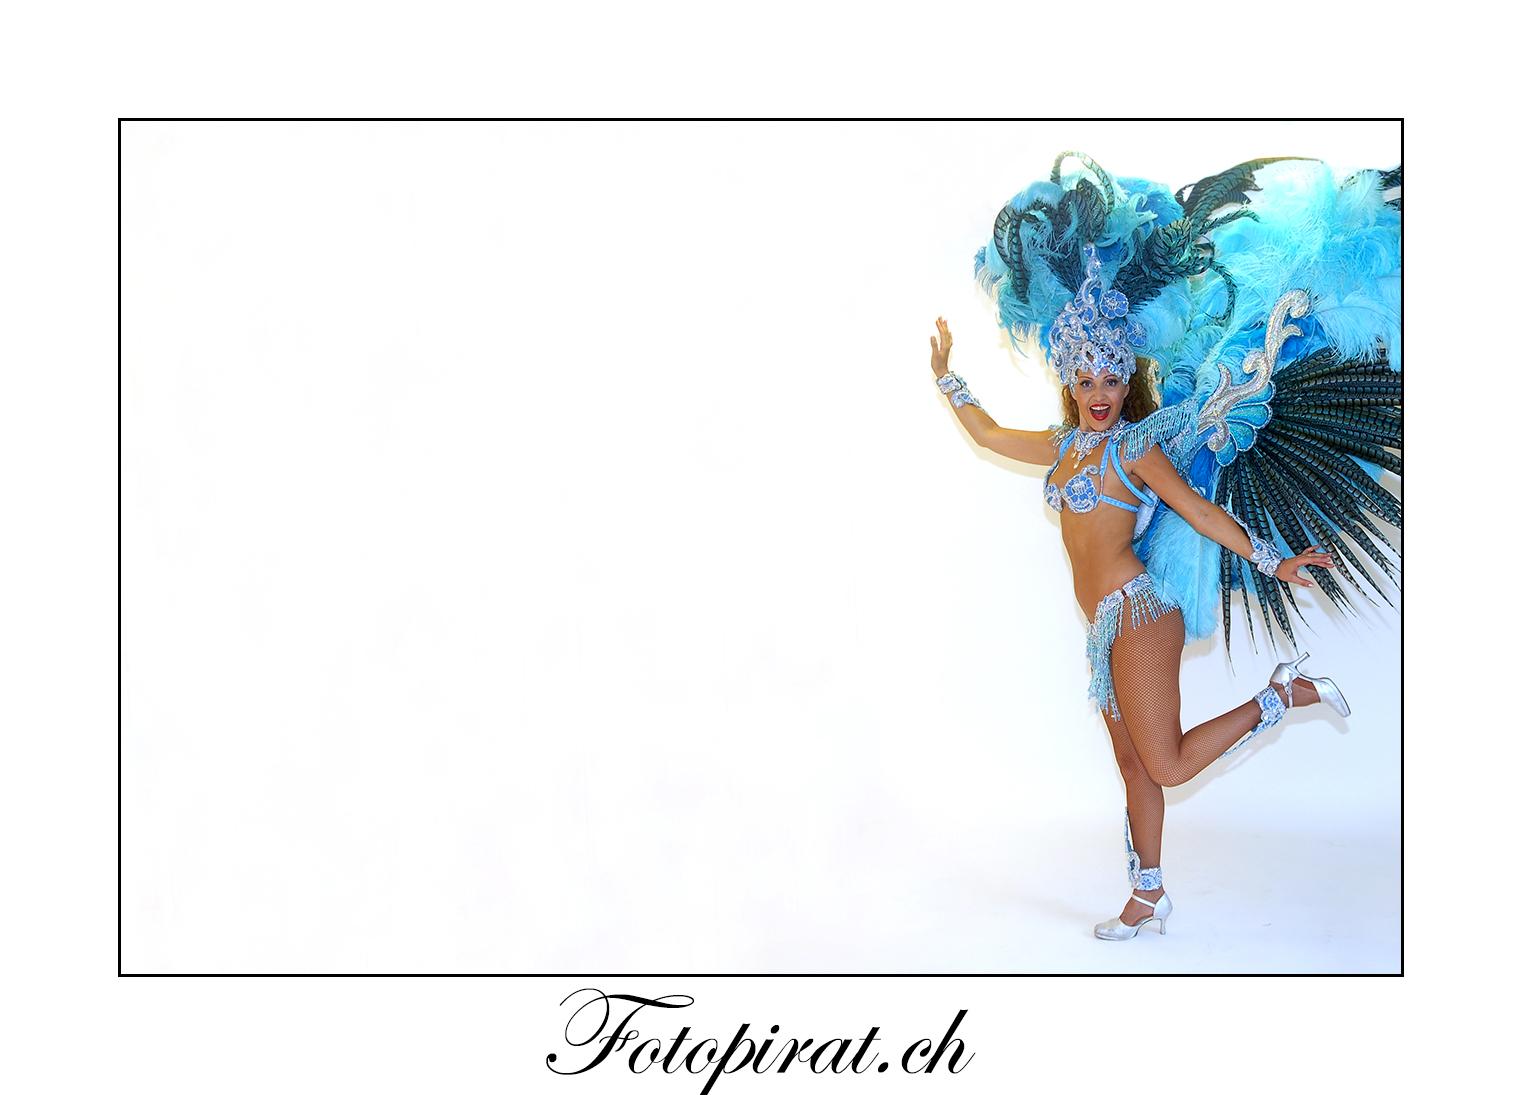 Fotoshooting, Fotostudio, Modelagentur, Fitnessmodel, Portrait, sexy Brasil. Fotomodel